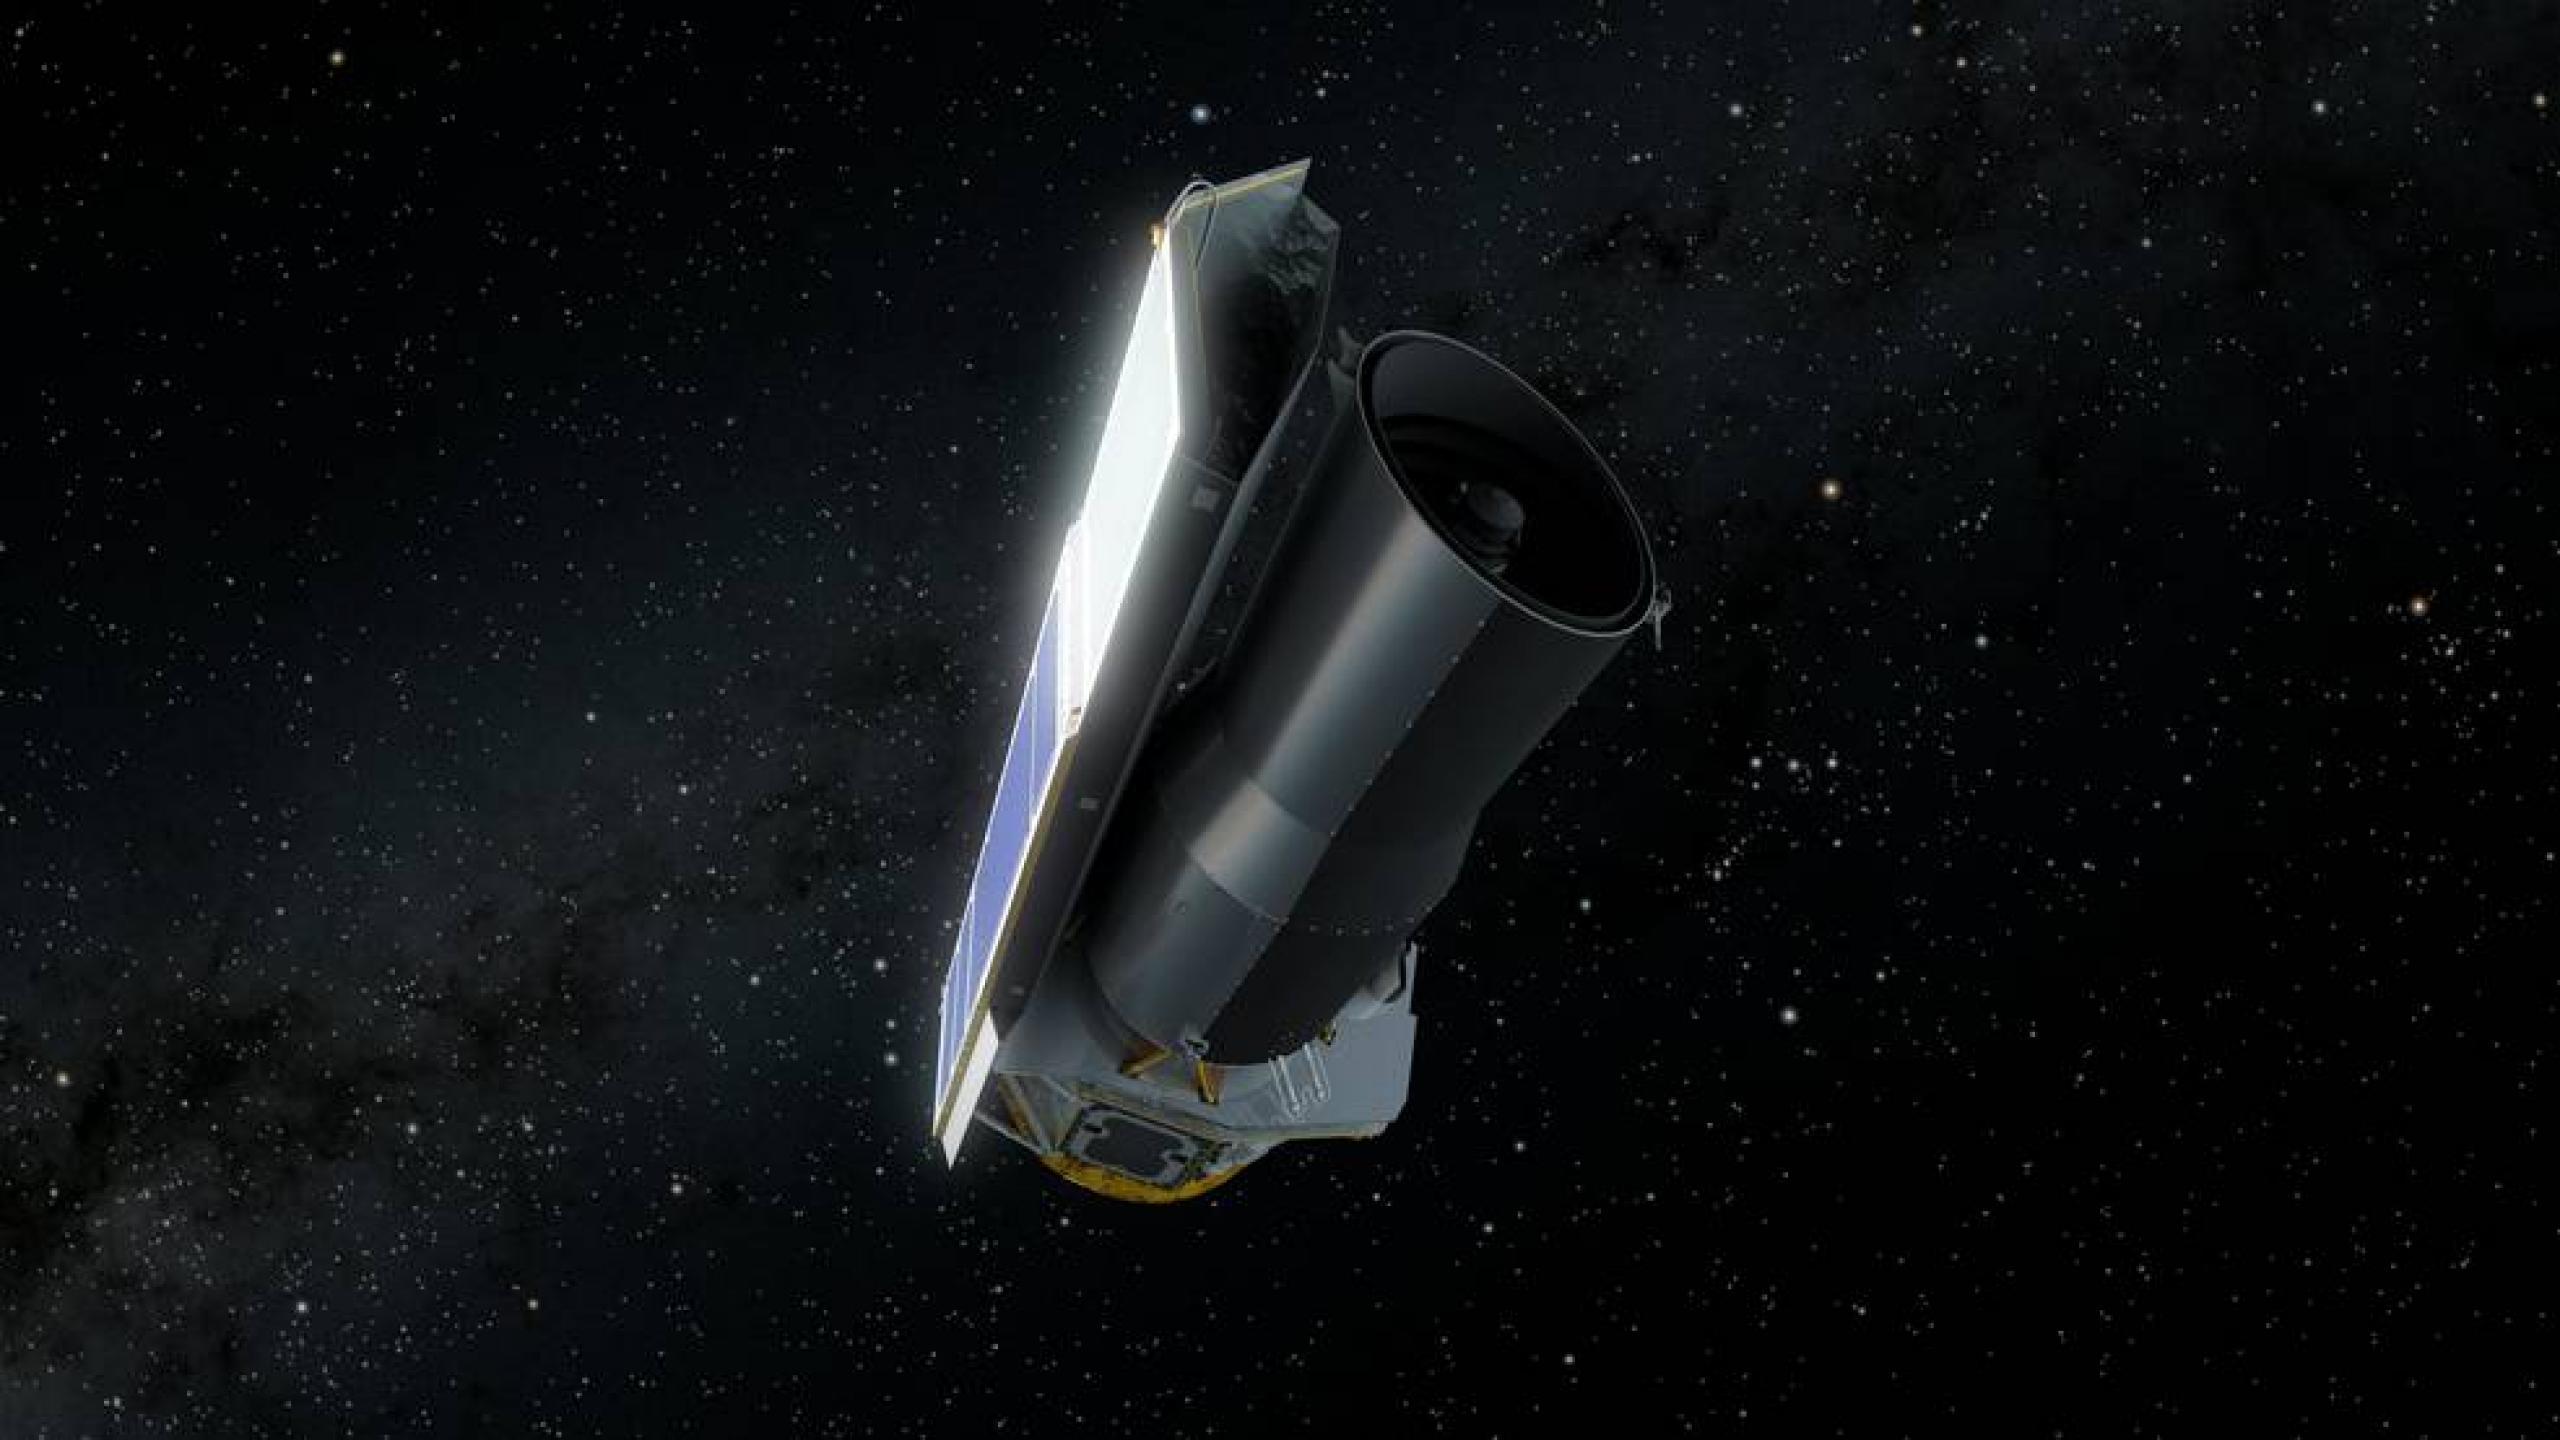 Artist rendition of Spitzer in space